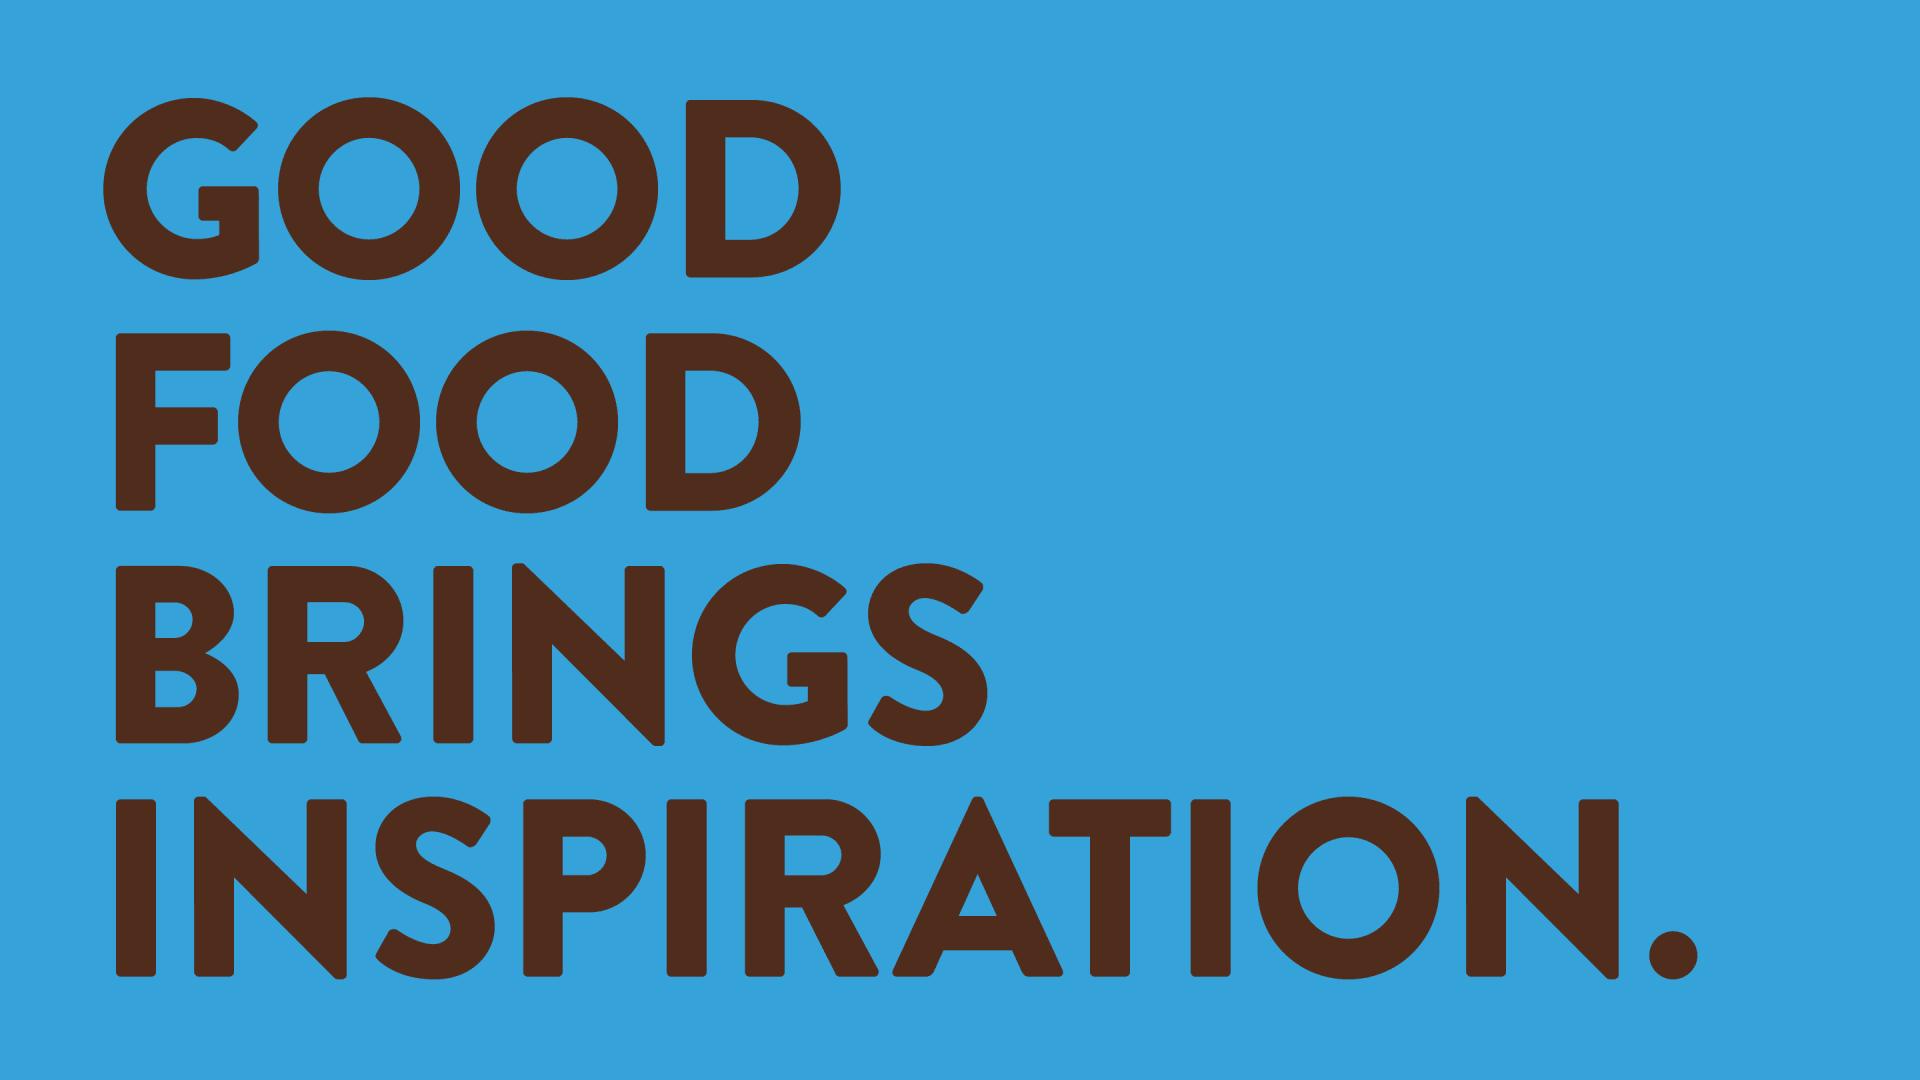 Cauldron brand messaging –good food brings inspiration